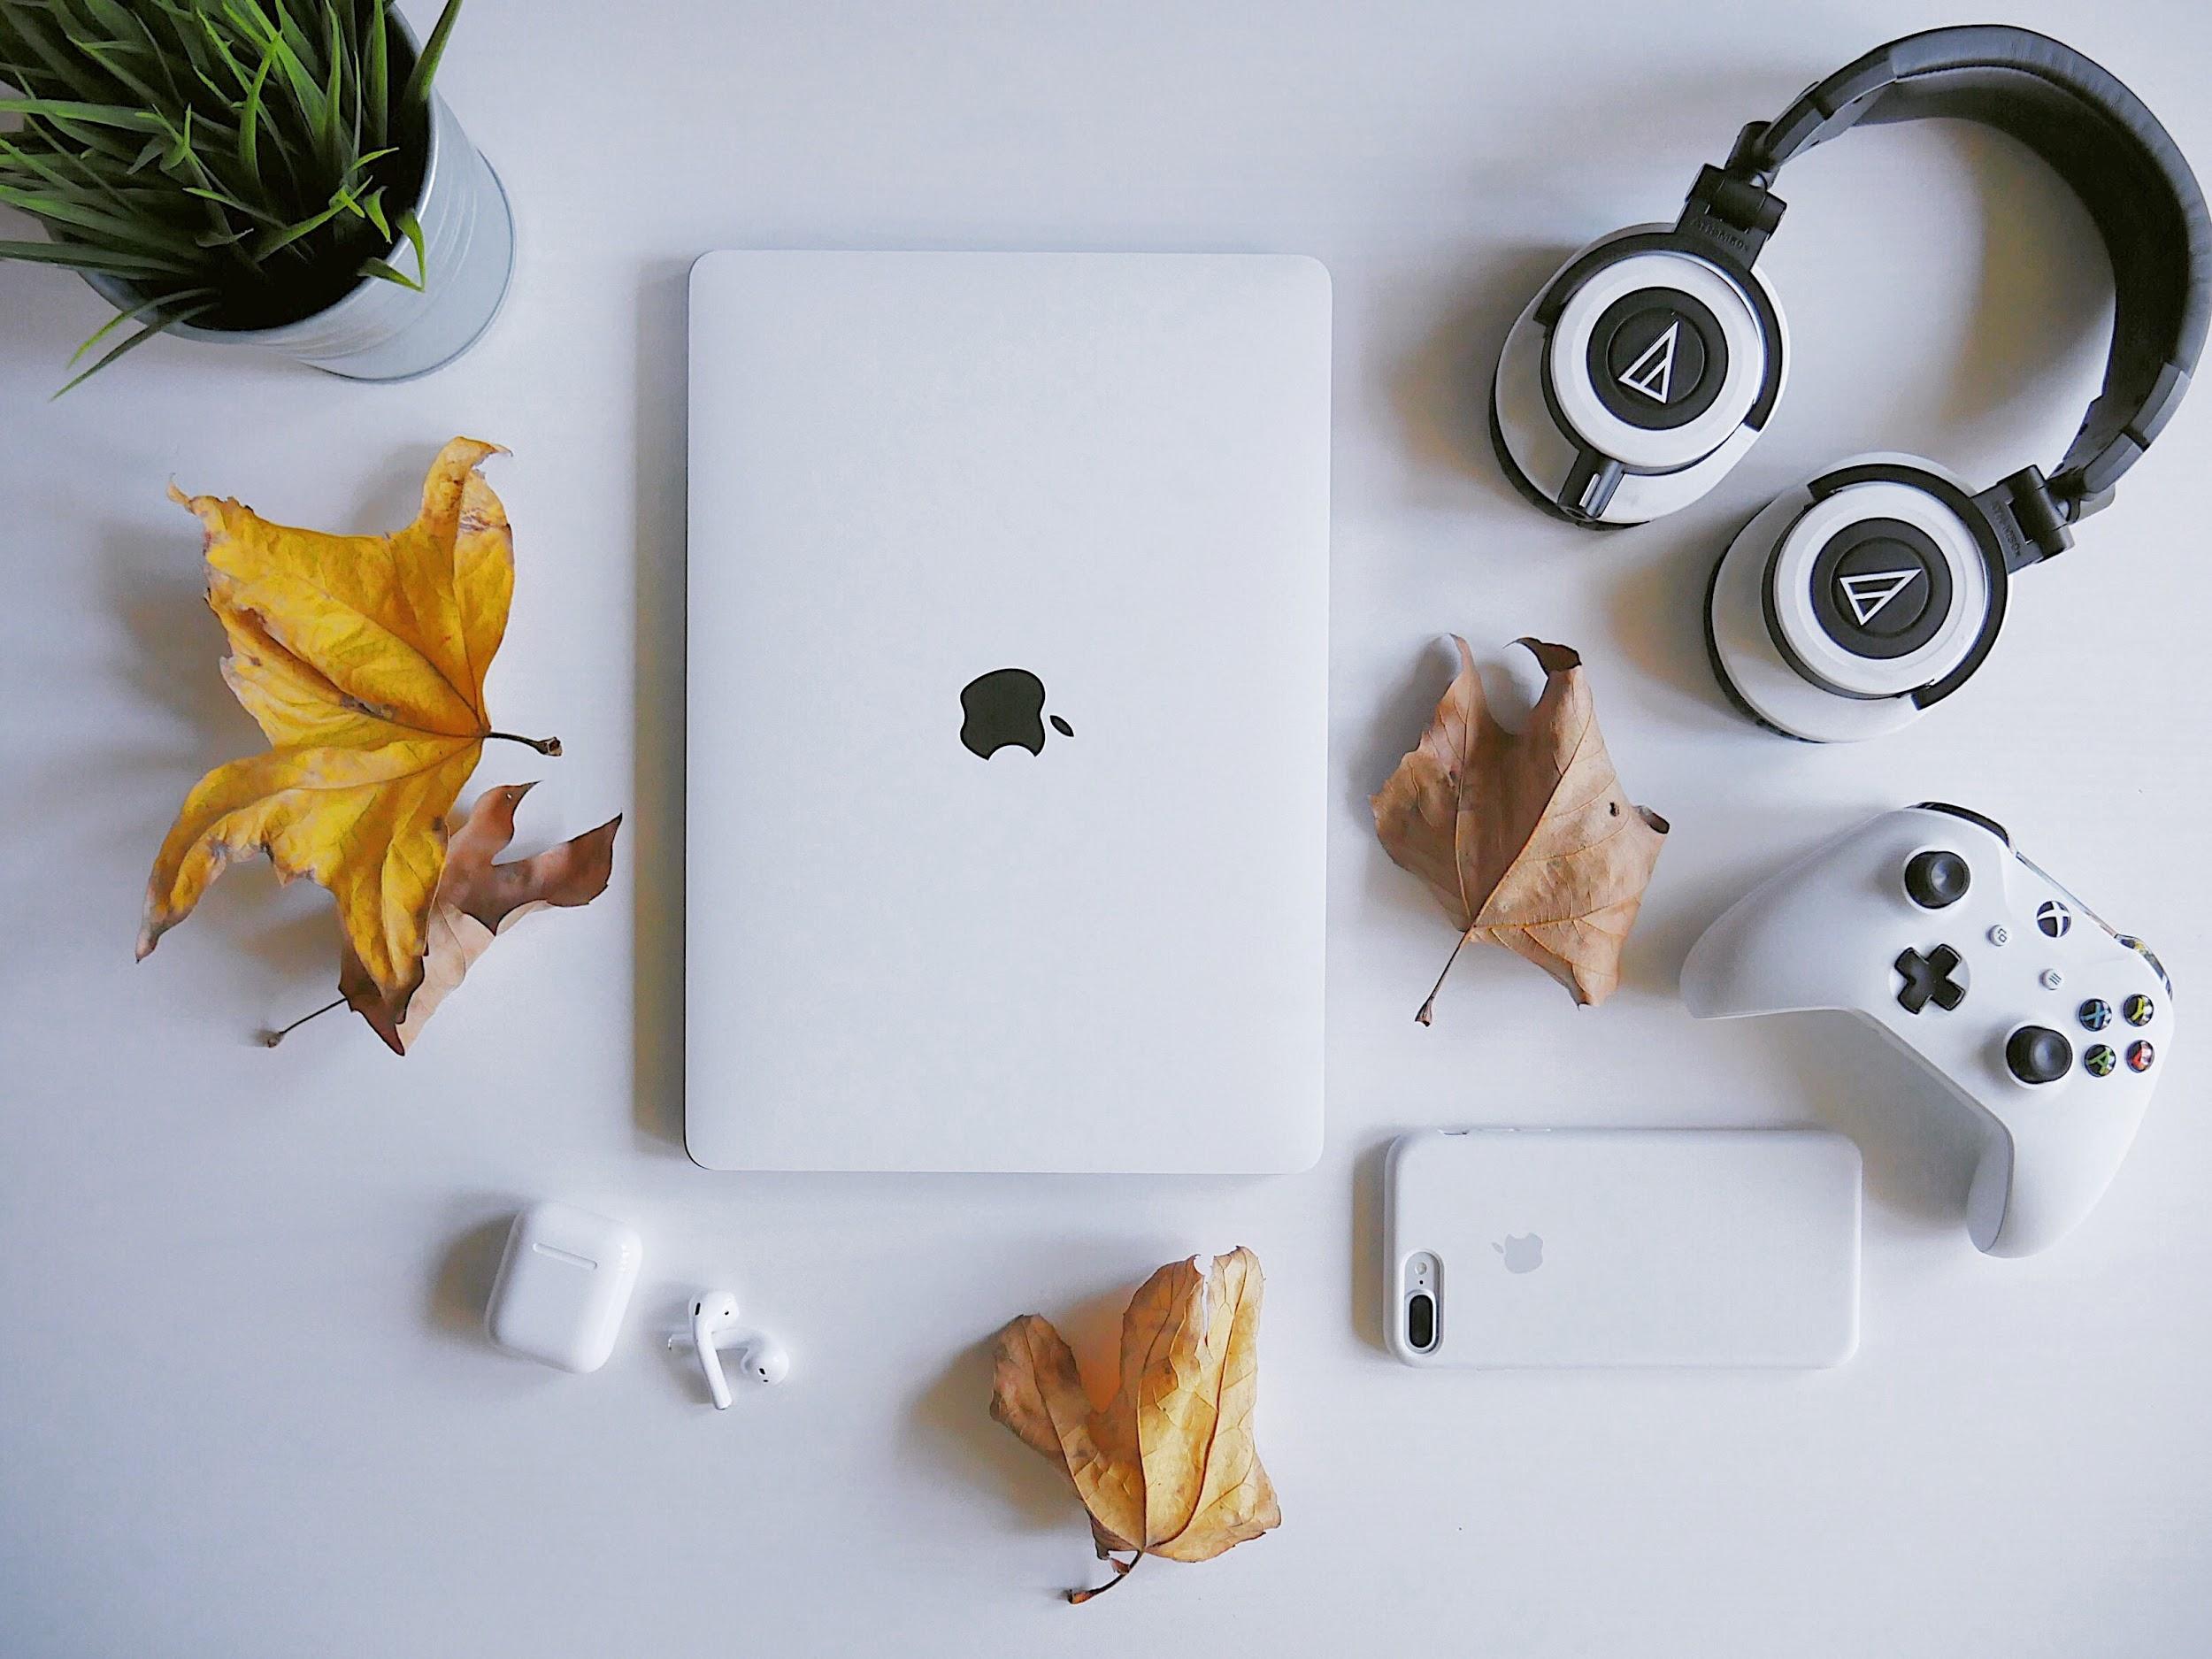 Mac Tricks and Hacks to Improve Efficiency